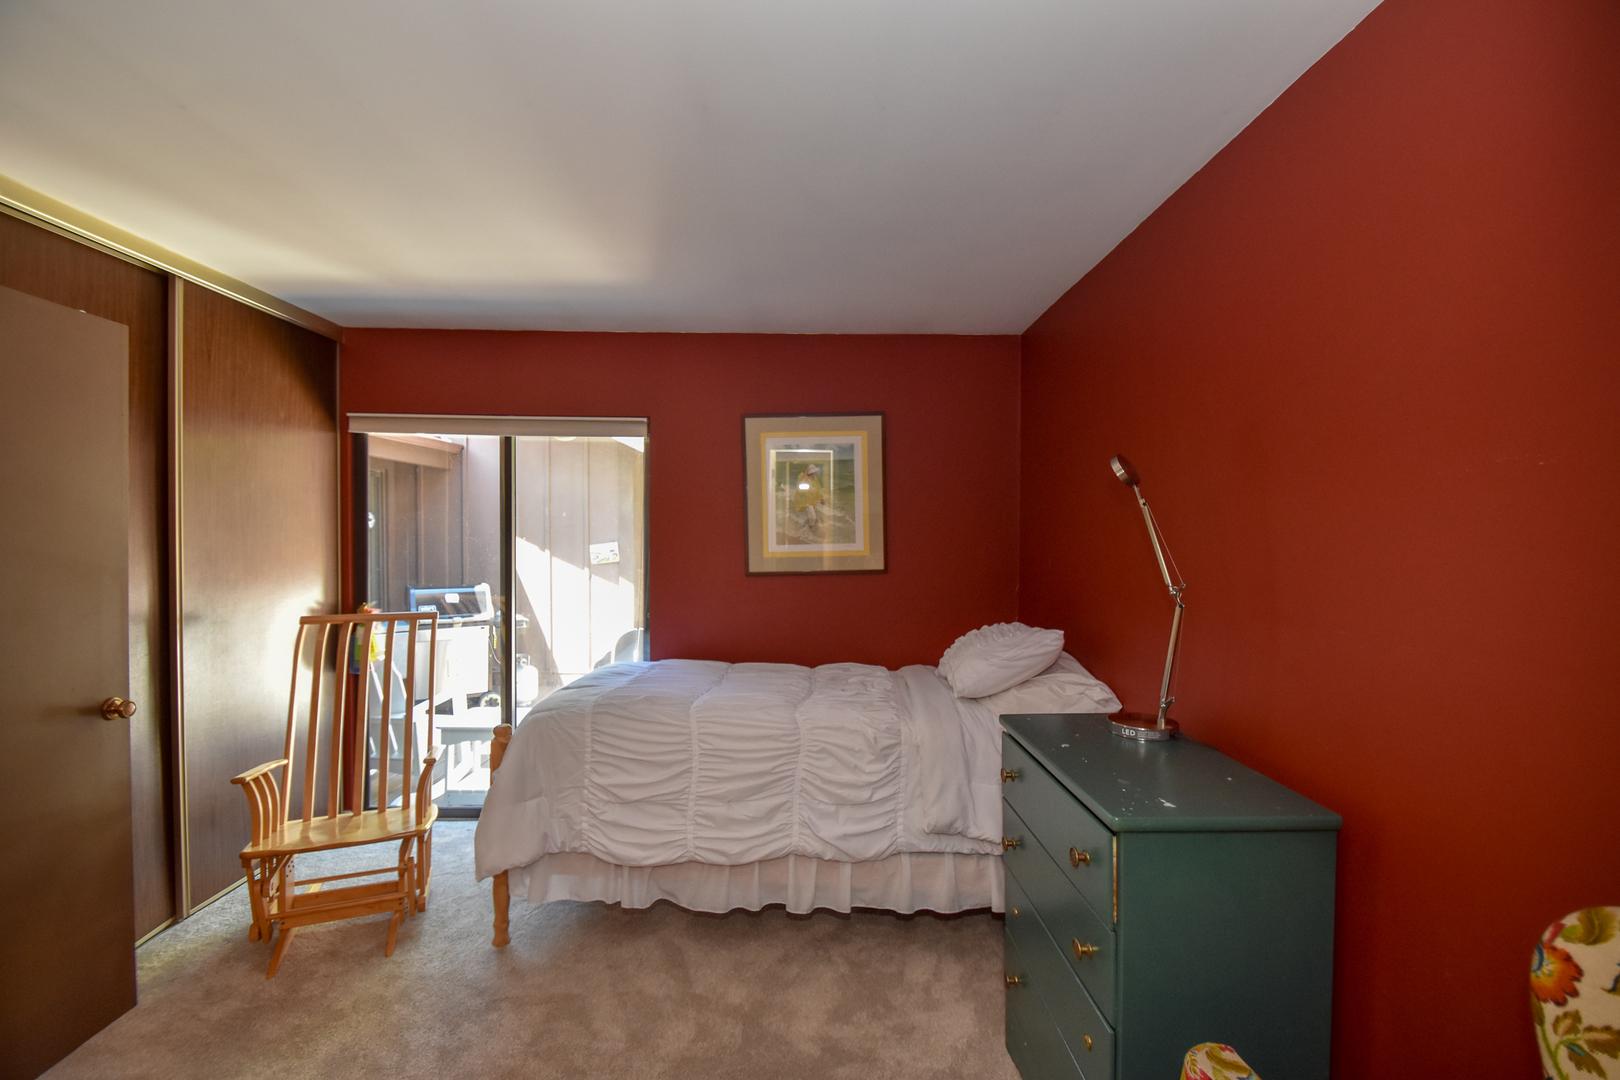 5N443 Red Bud, ST. CHARLES, Illinois, 60175